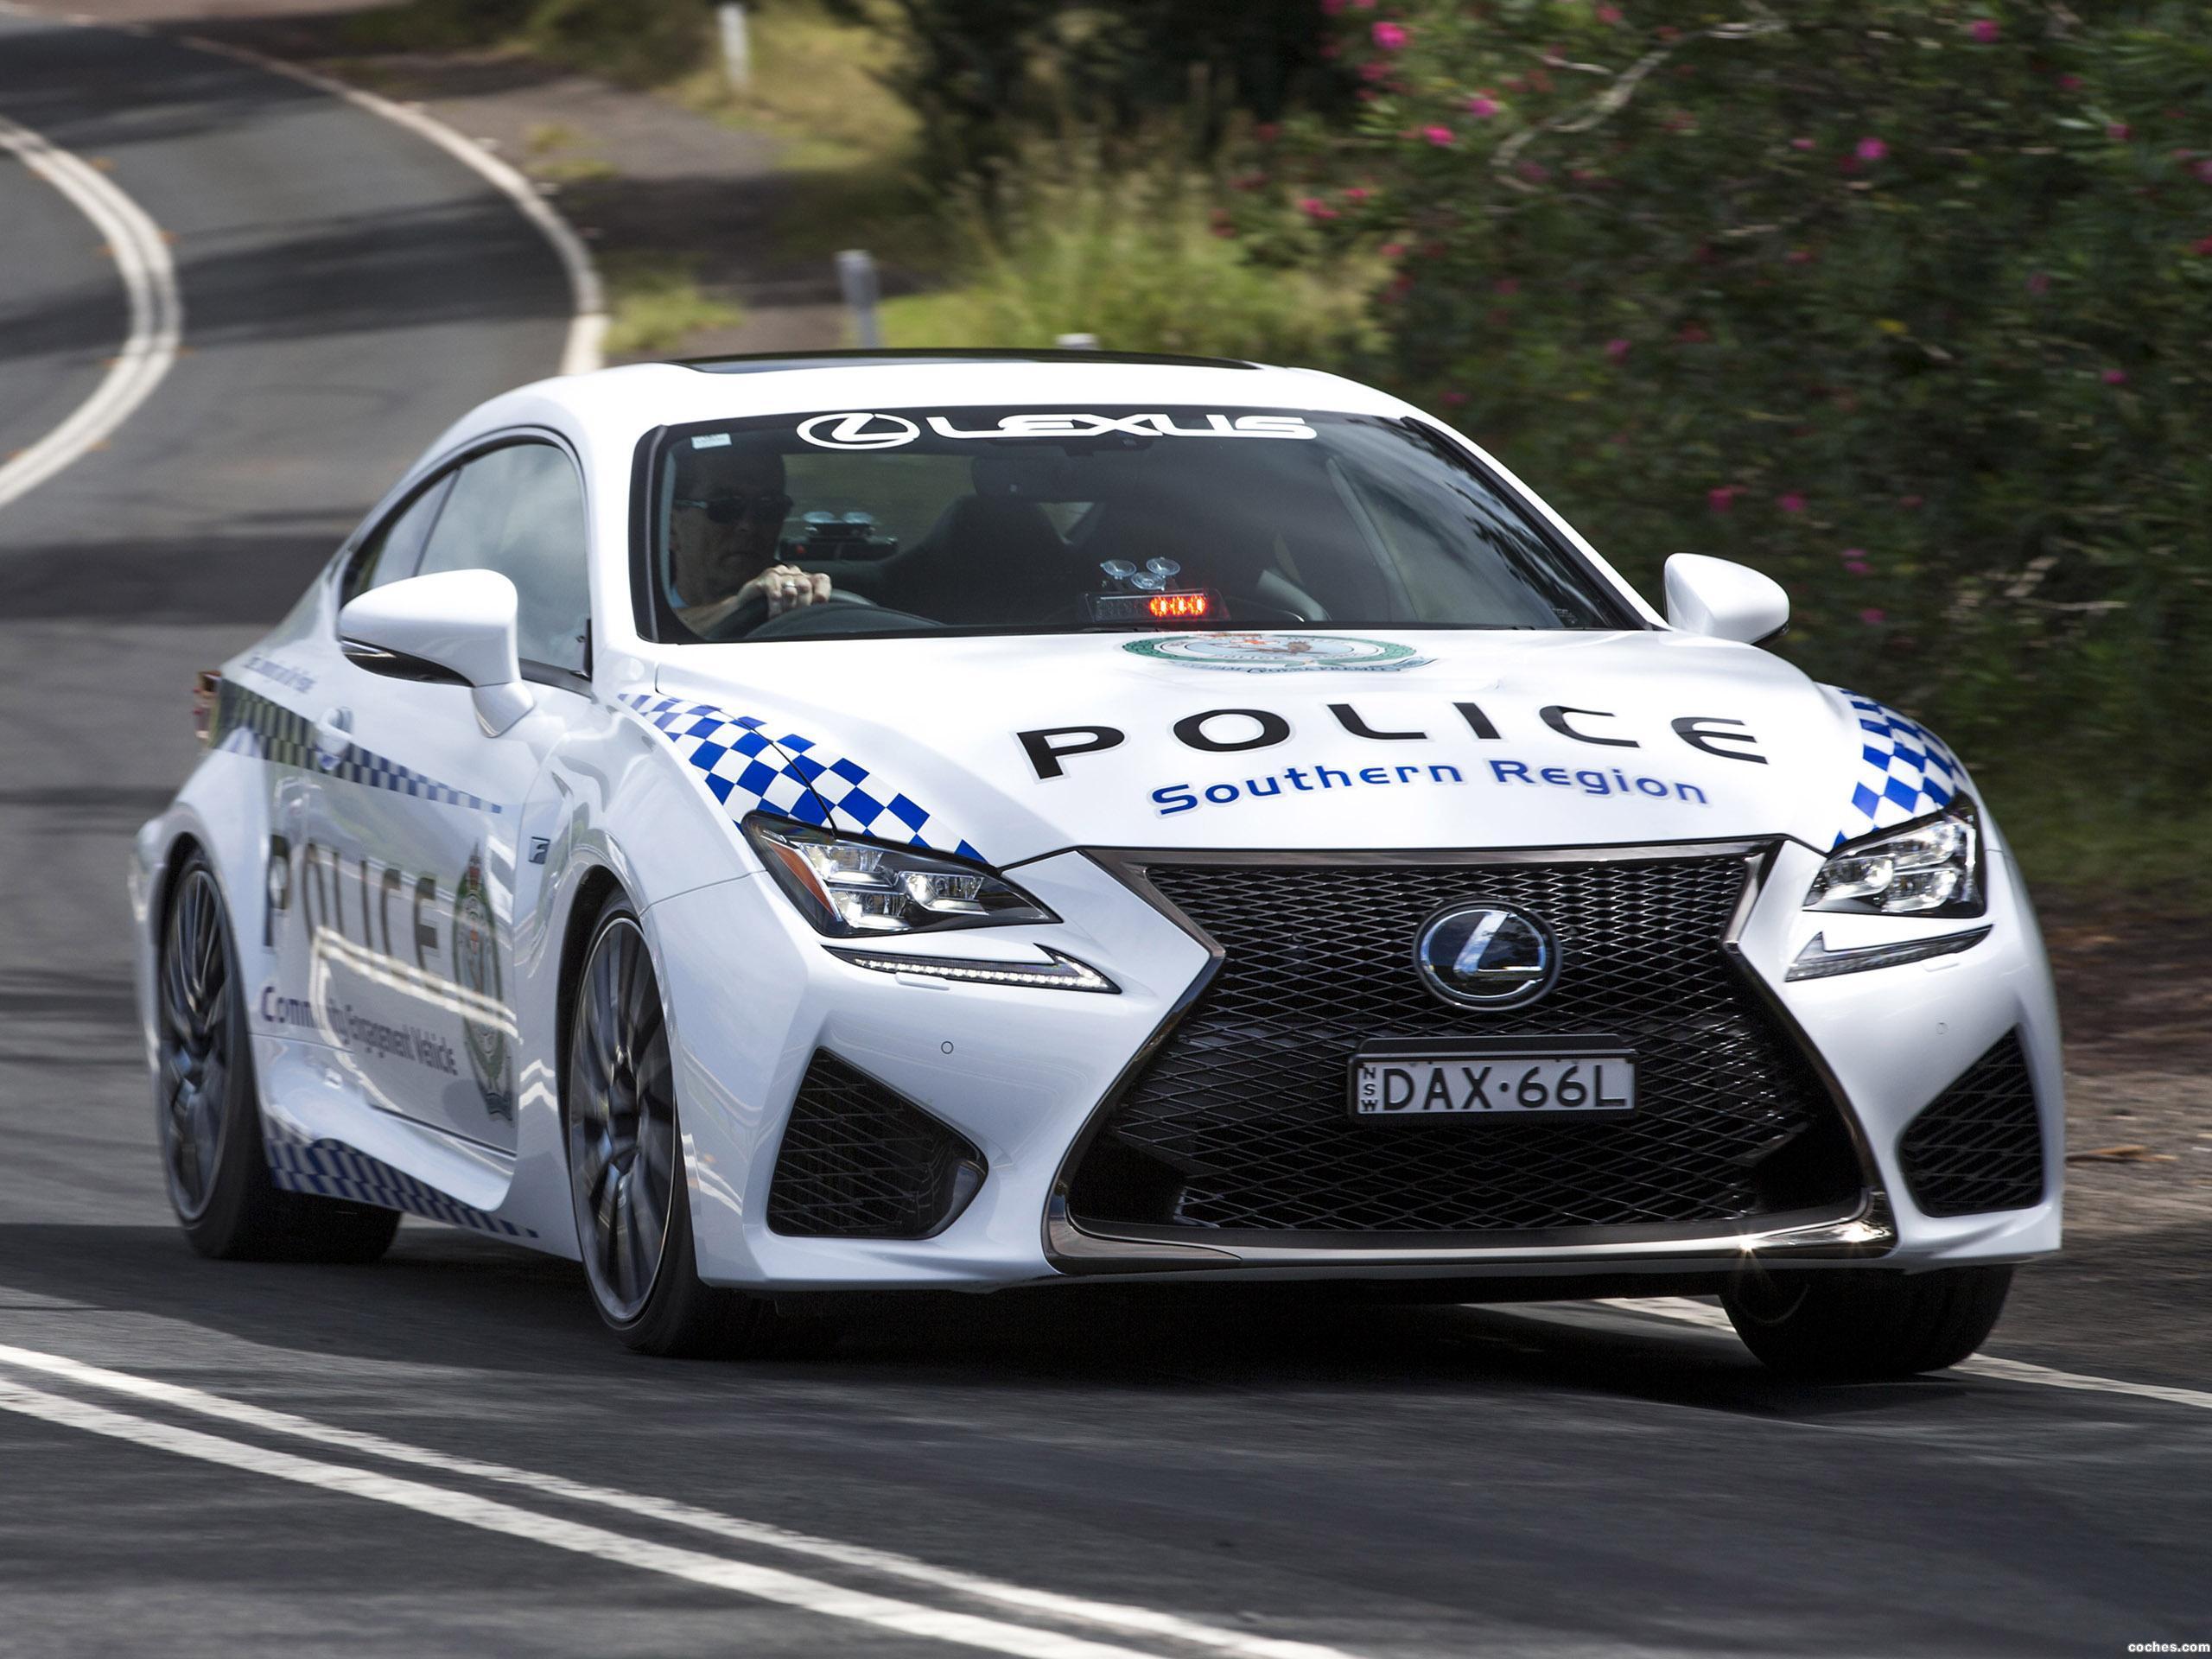 Foto 0 de Lexus RC-F Police Car Australia 2016